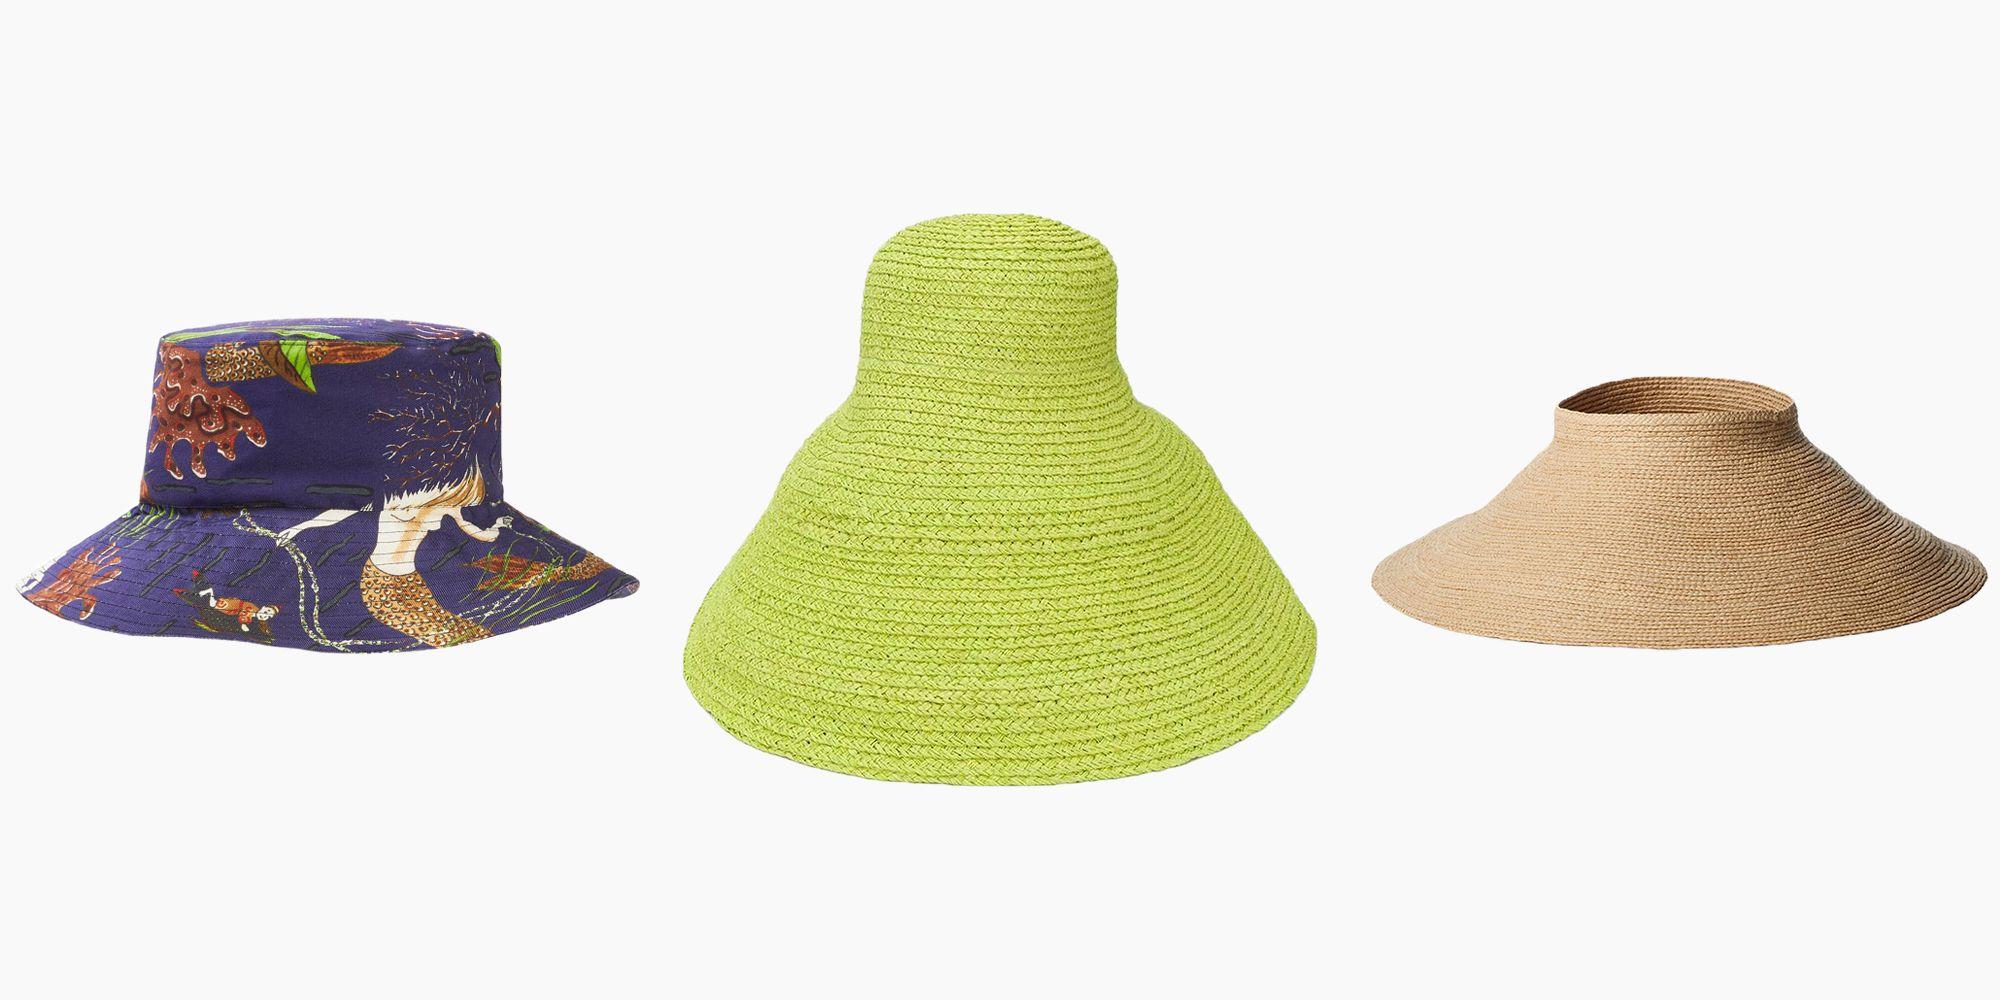 25 Summer Hats To Wear That Won't Wear You